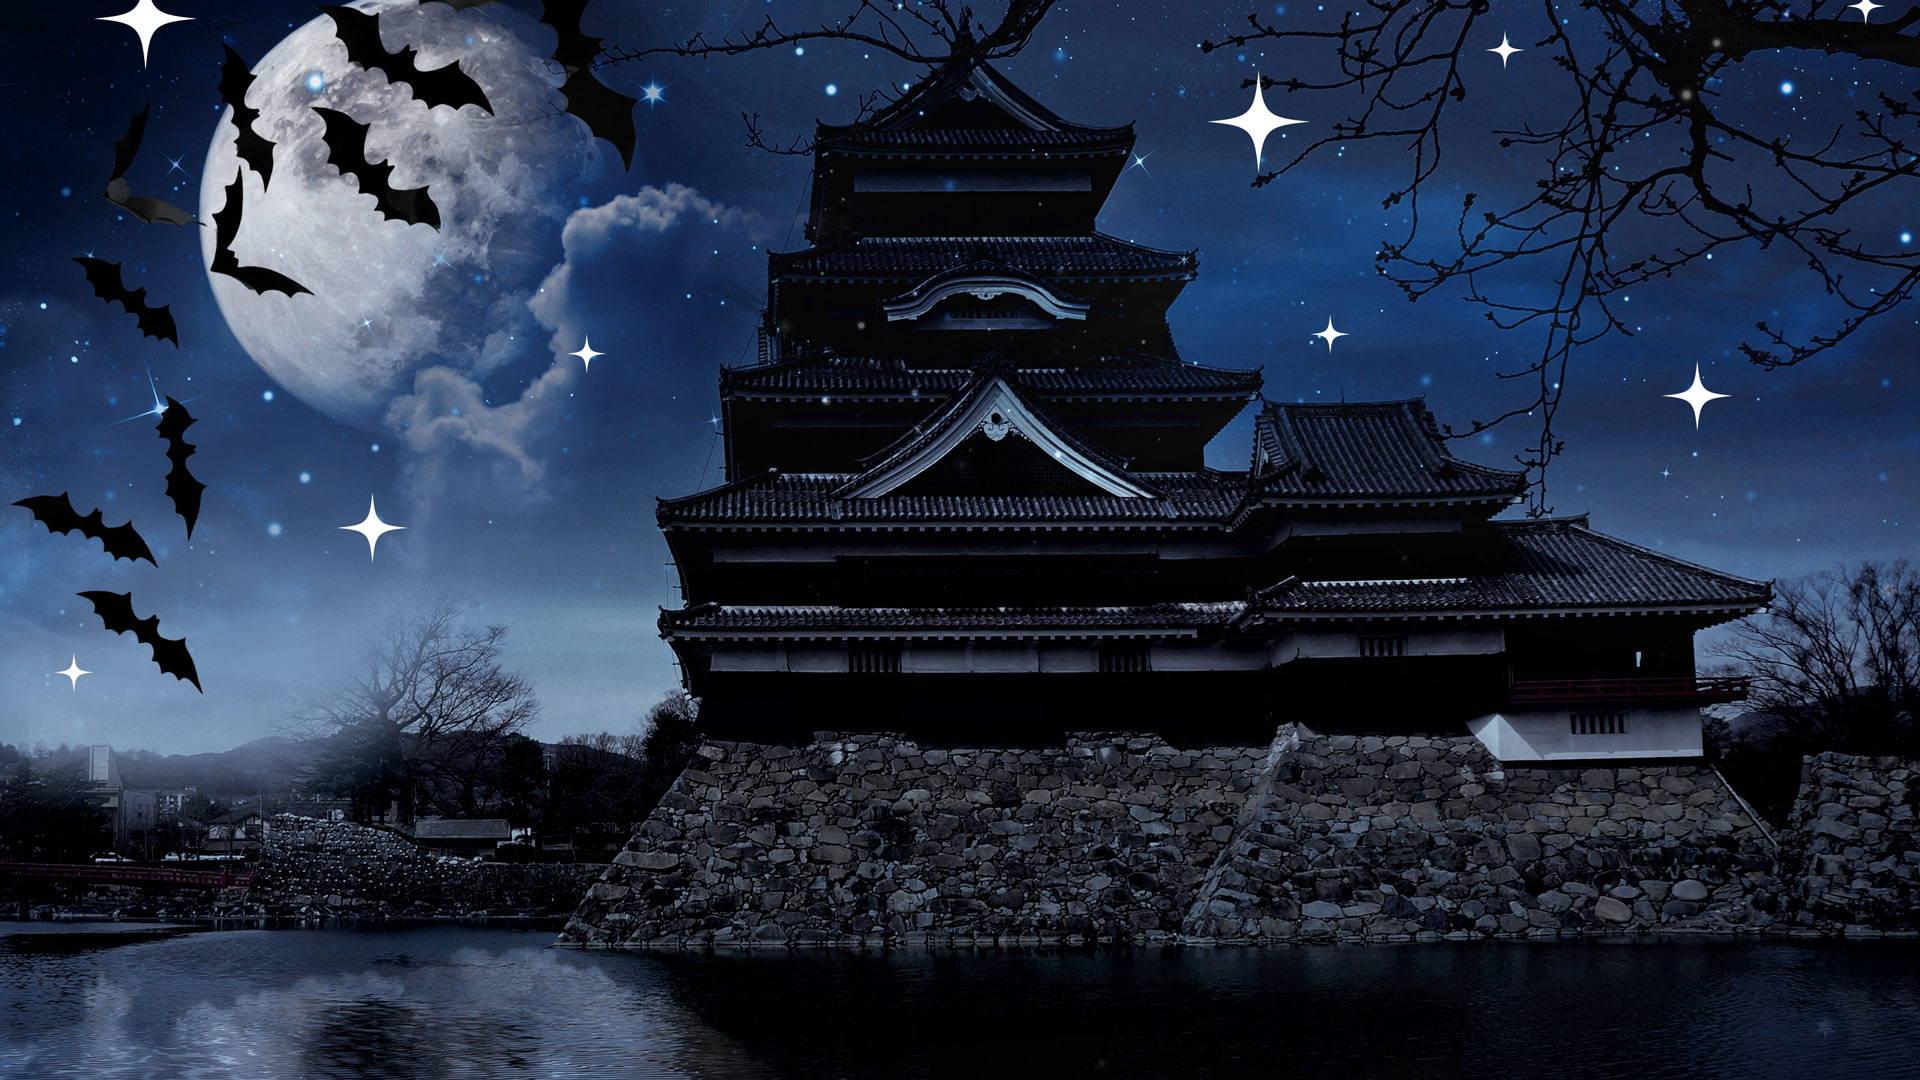 Spooky Japanese Castle